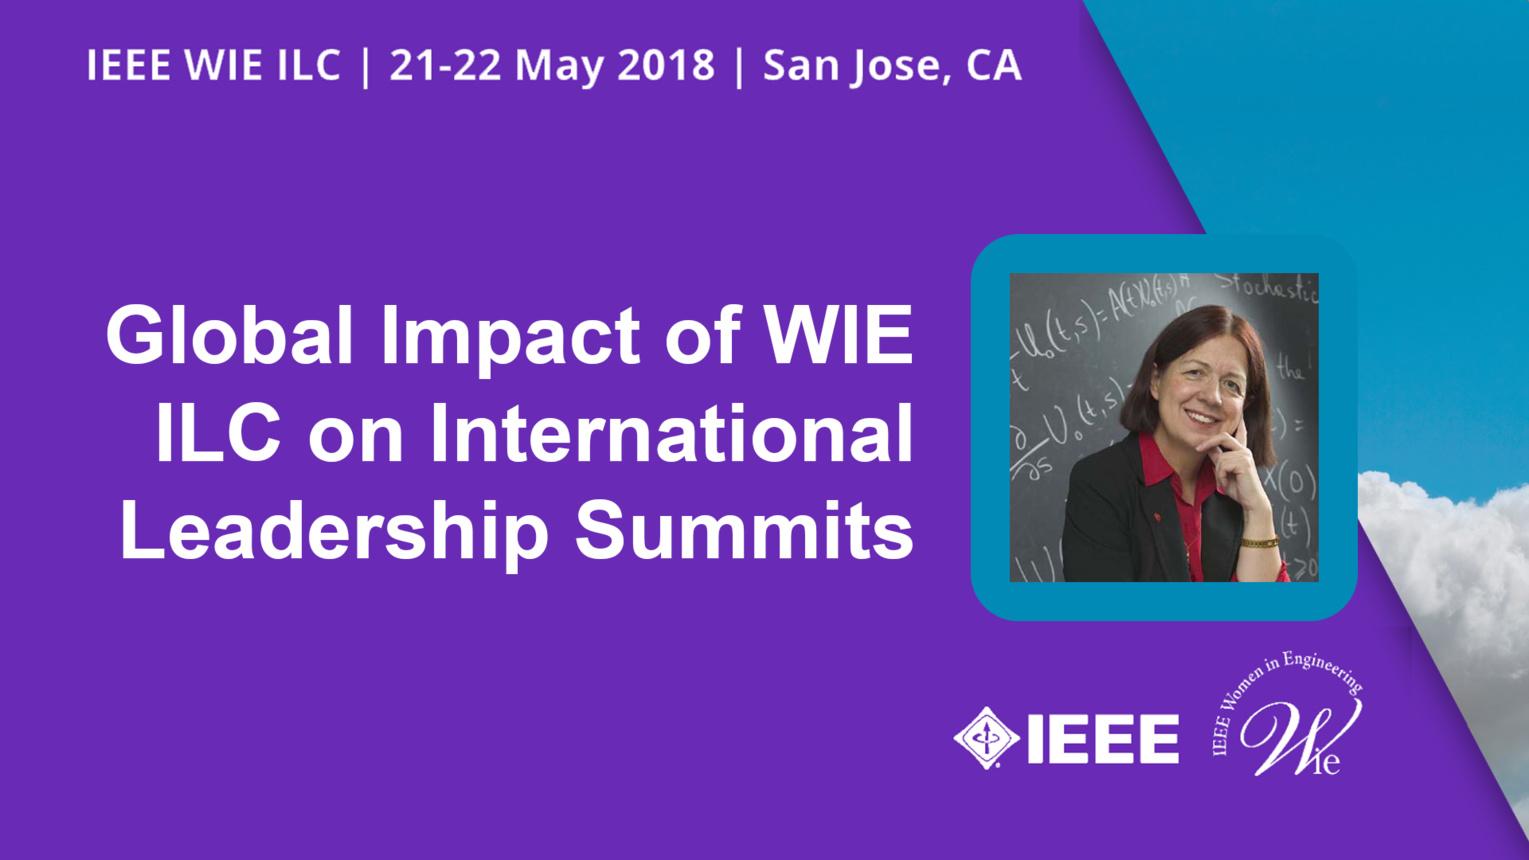 Global Impact of WIE ILC on International Leadership Summits - Bozenna Pasik-Duncan - WIE ILC 2018